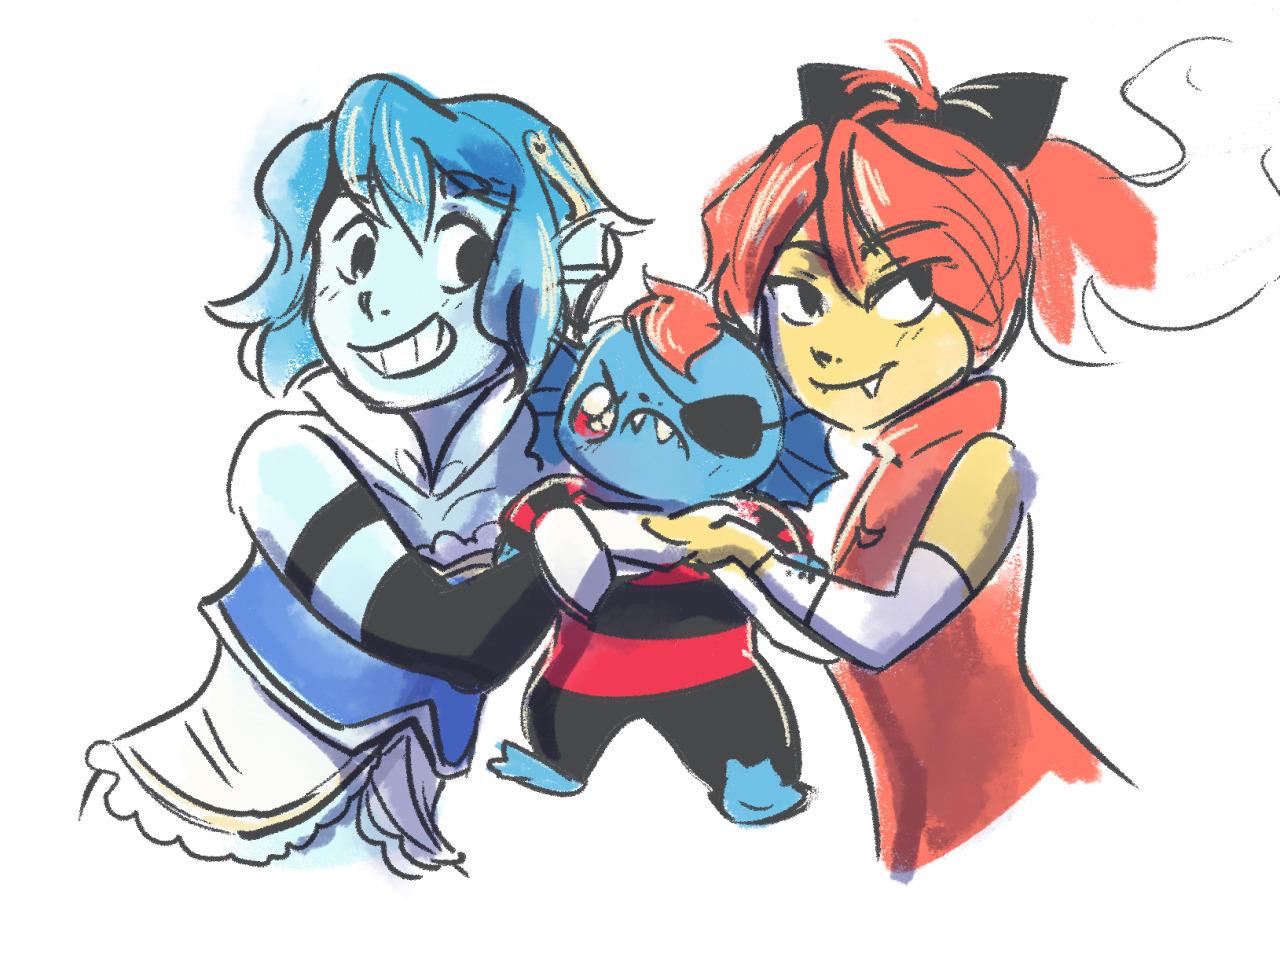 Anime Cute Lesbians magical lesbian spawn | undertale | know your meme